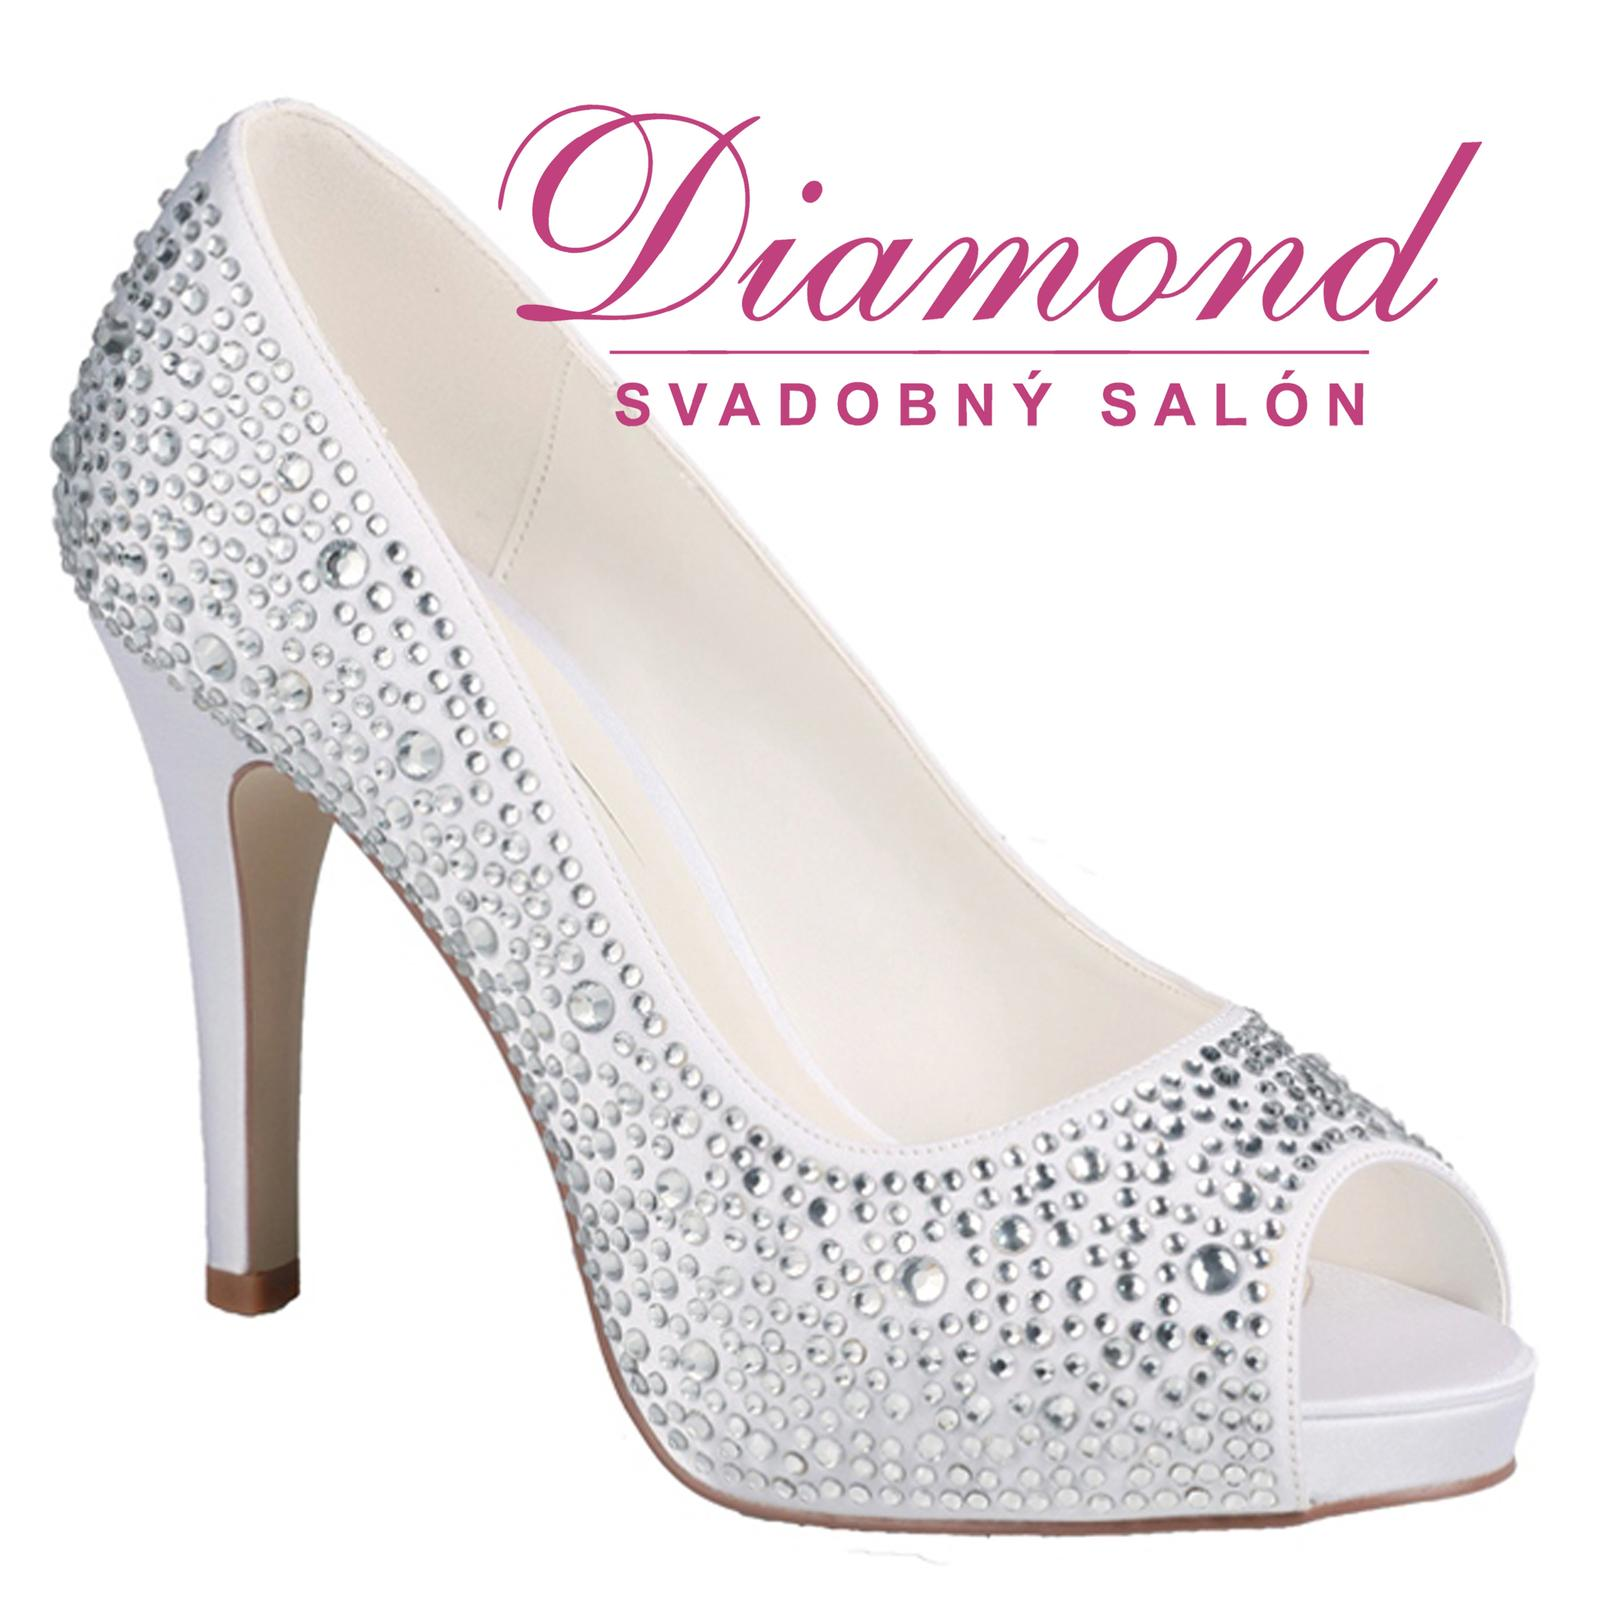 Svadobné topánky Roxanne - Obrázok č. 1